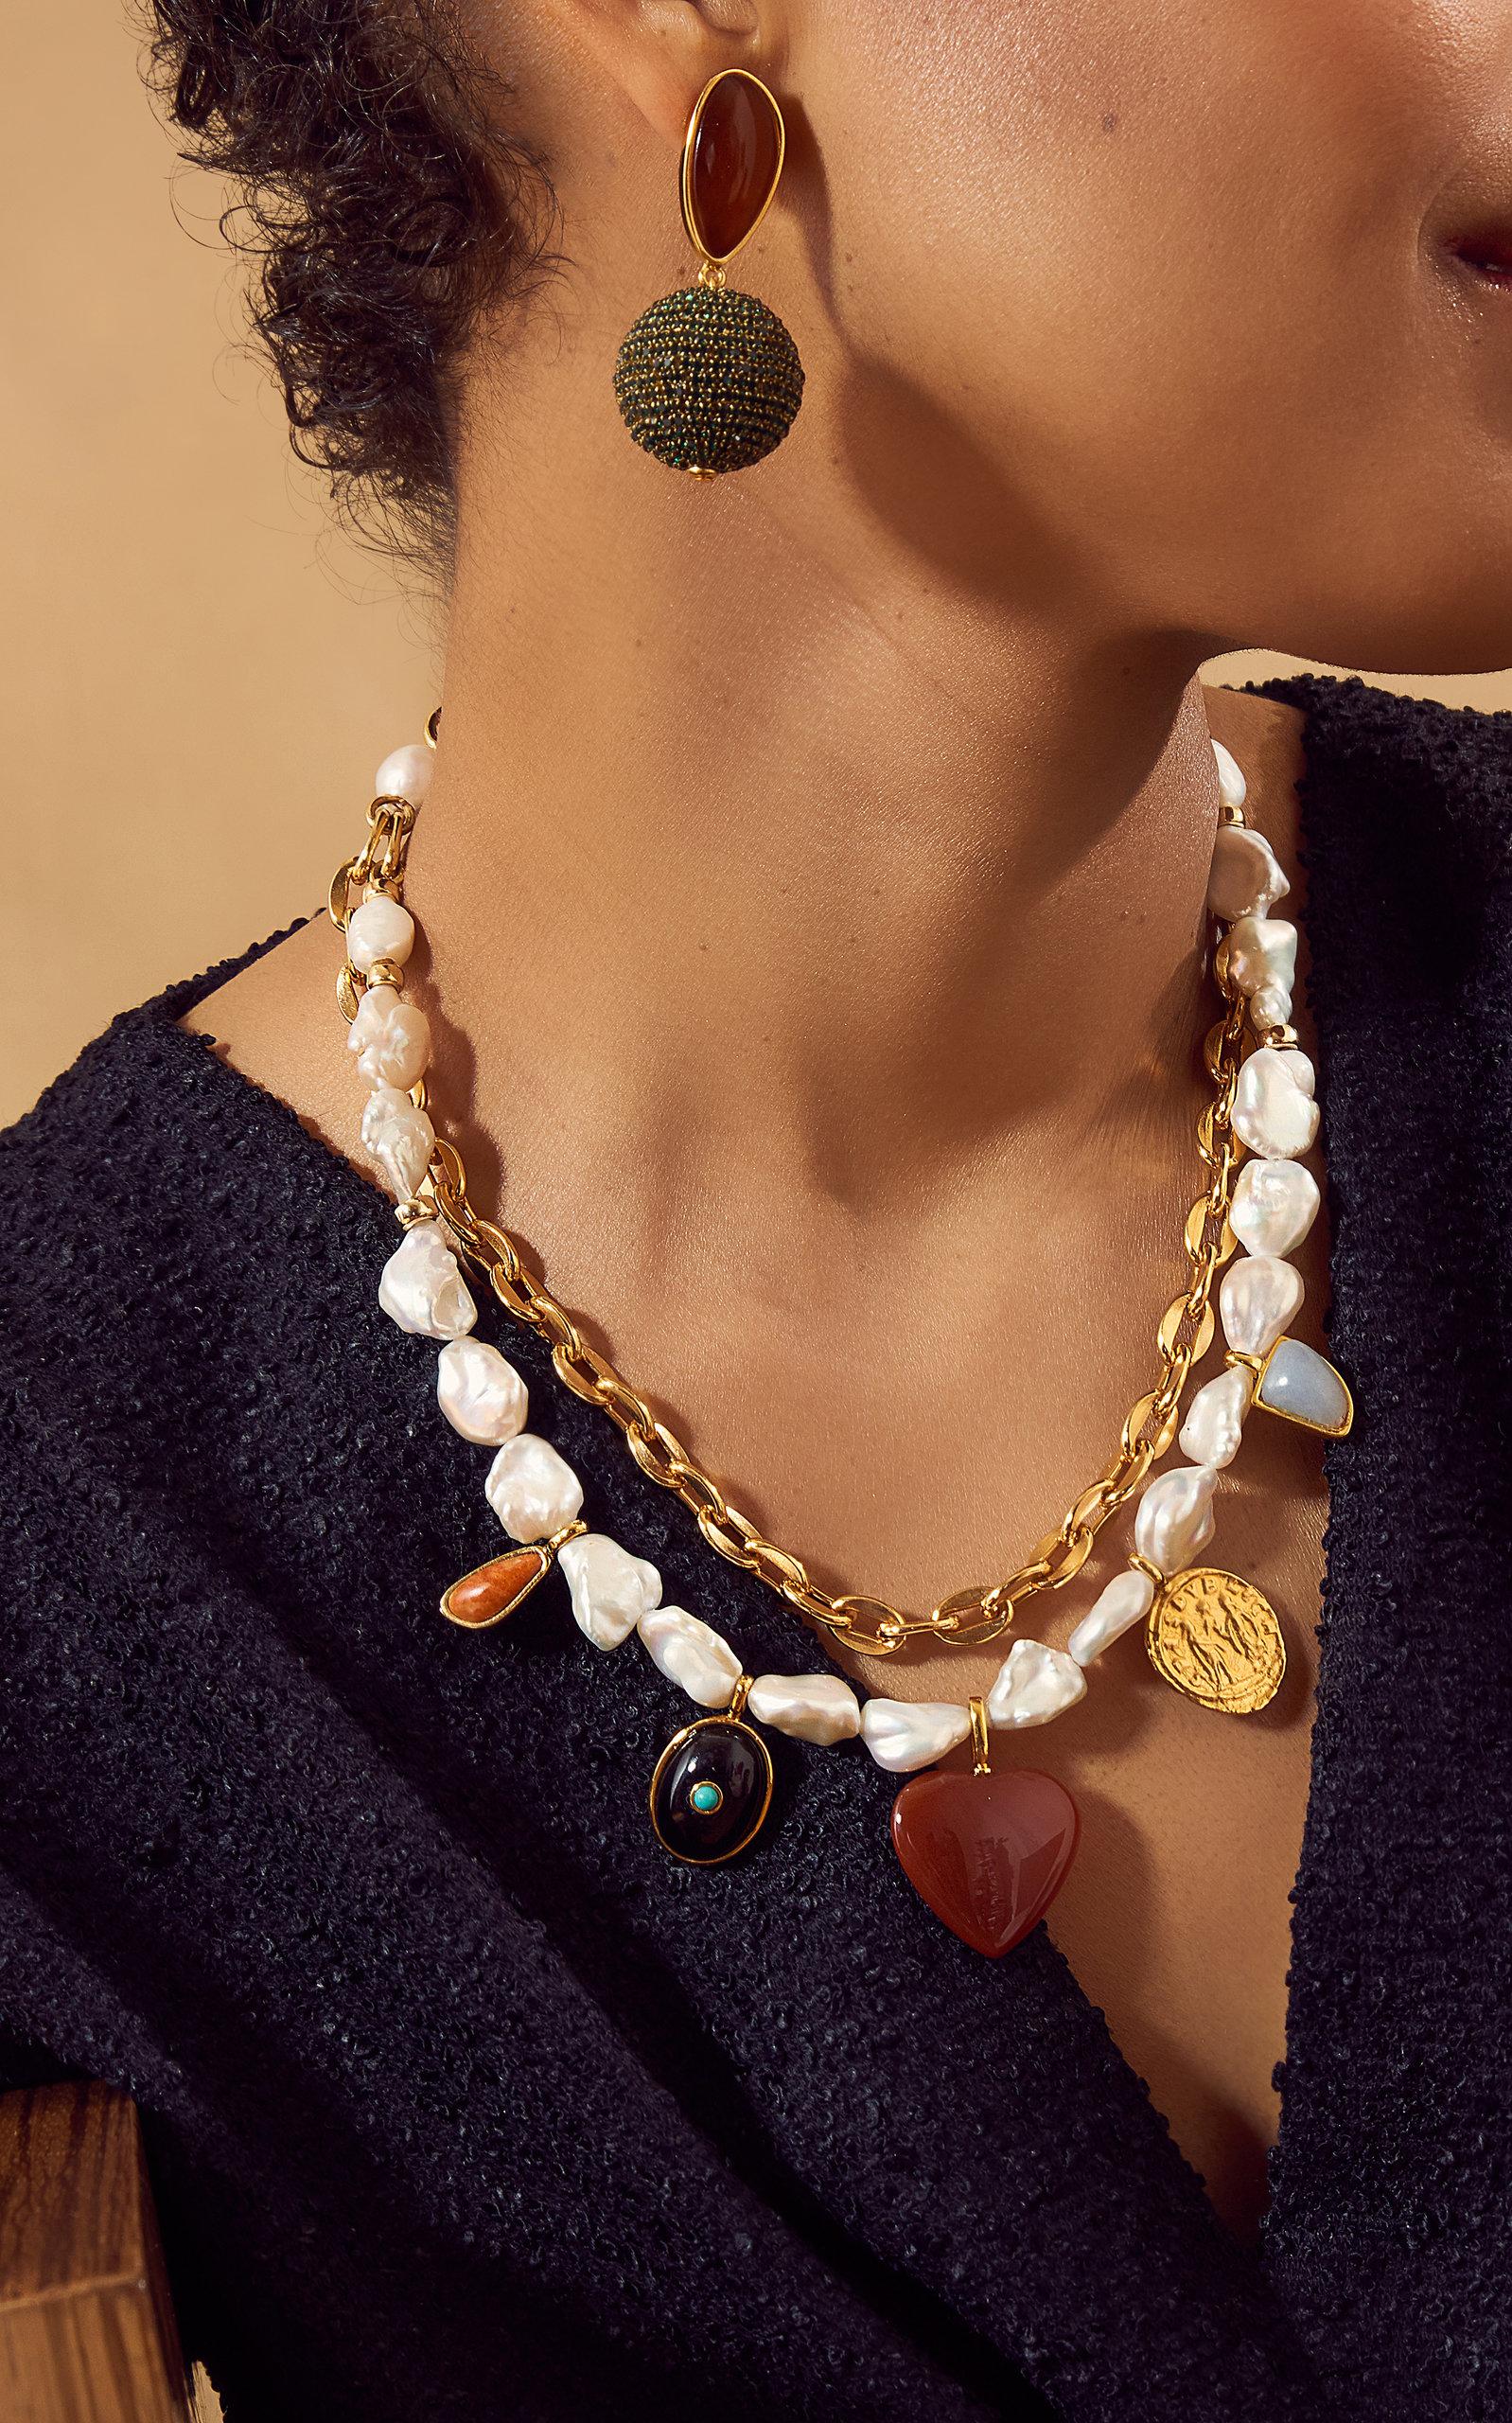 Clear Powerfulline Stylish Girls Women Korean Style Transparent Flower Earrings Party Shopping Ear Studs